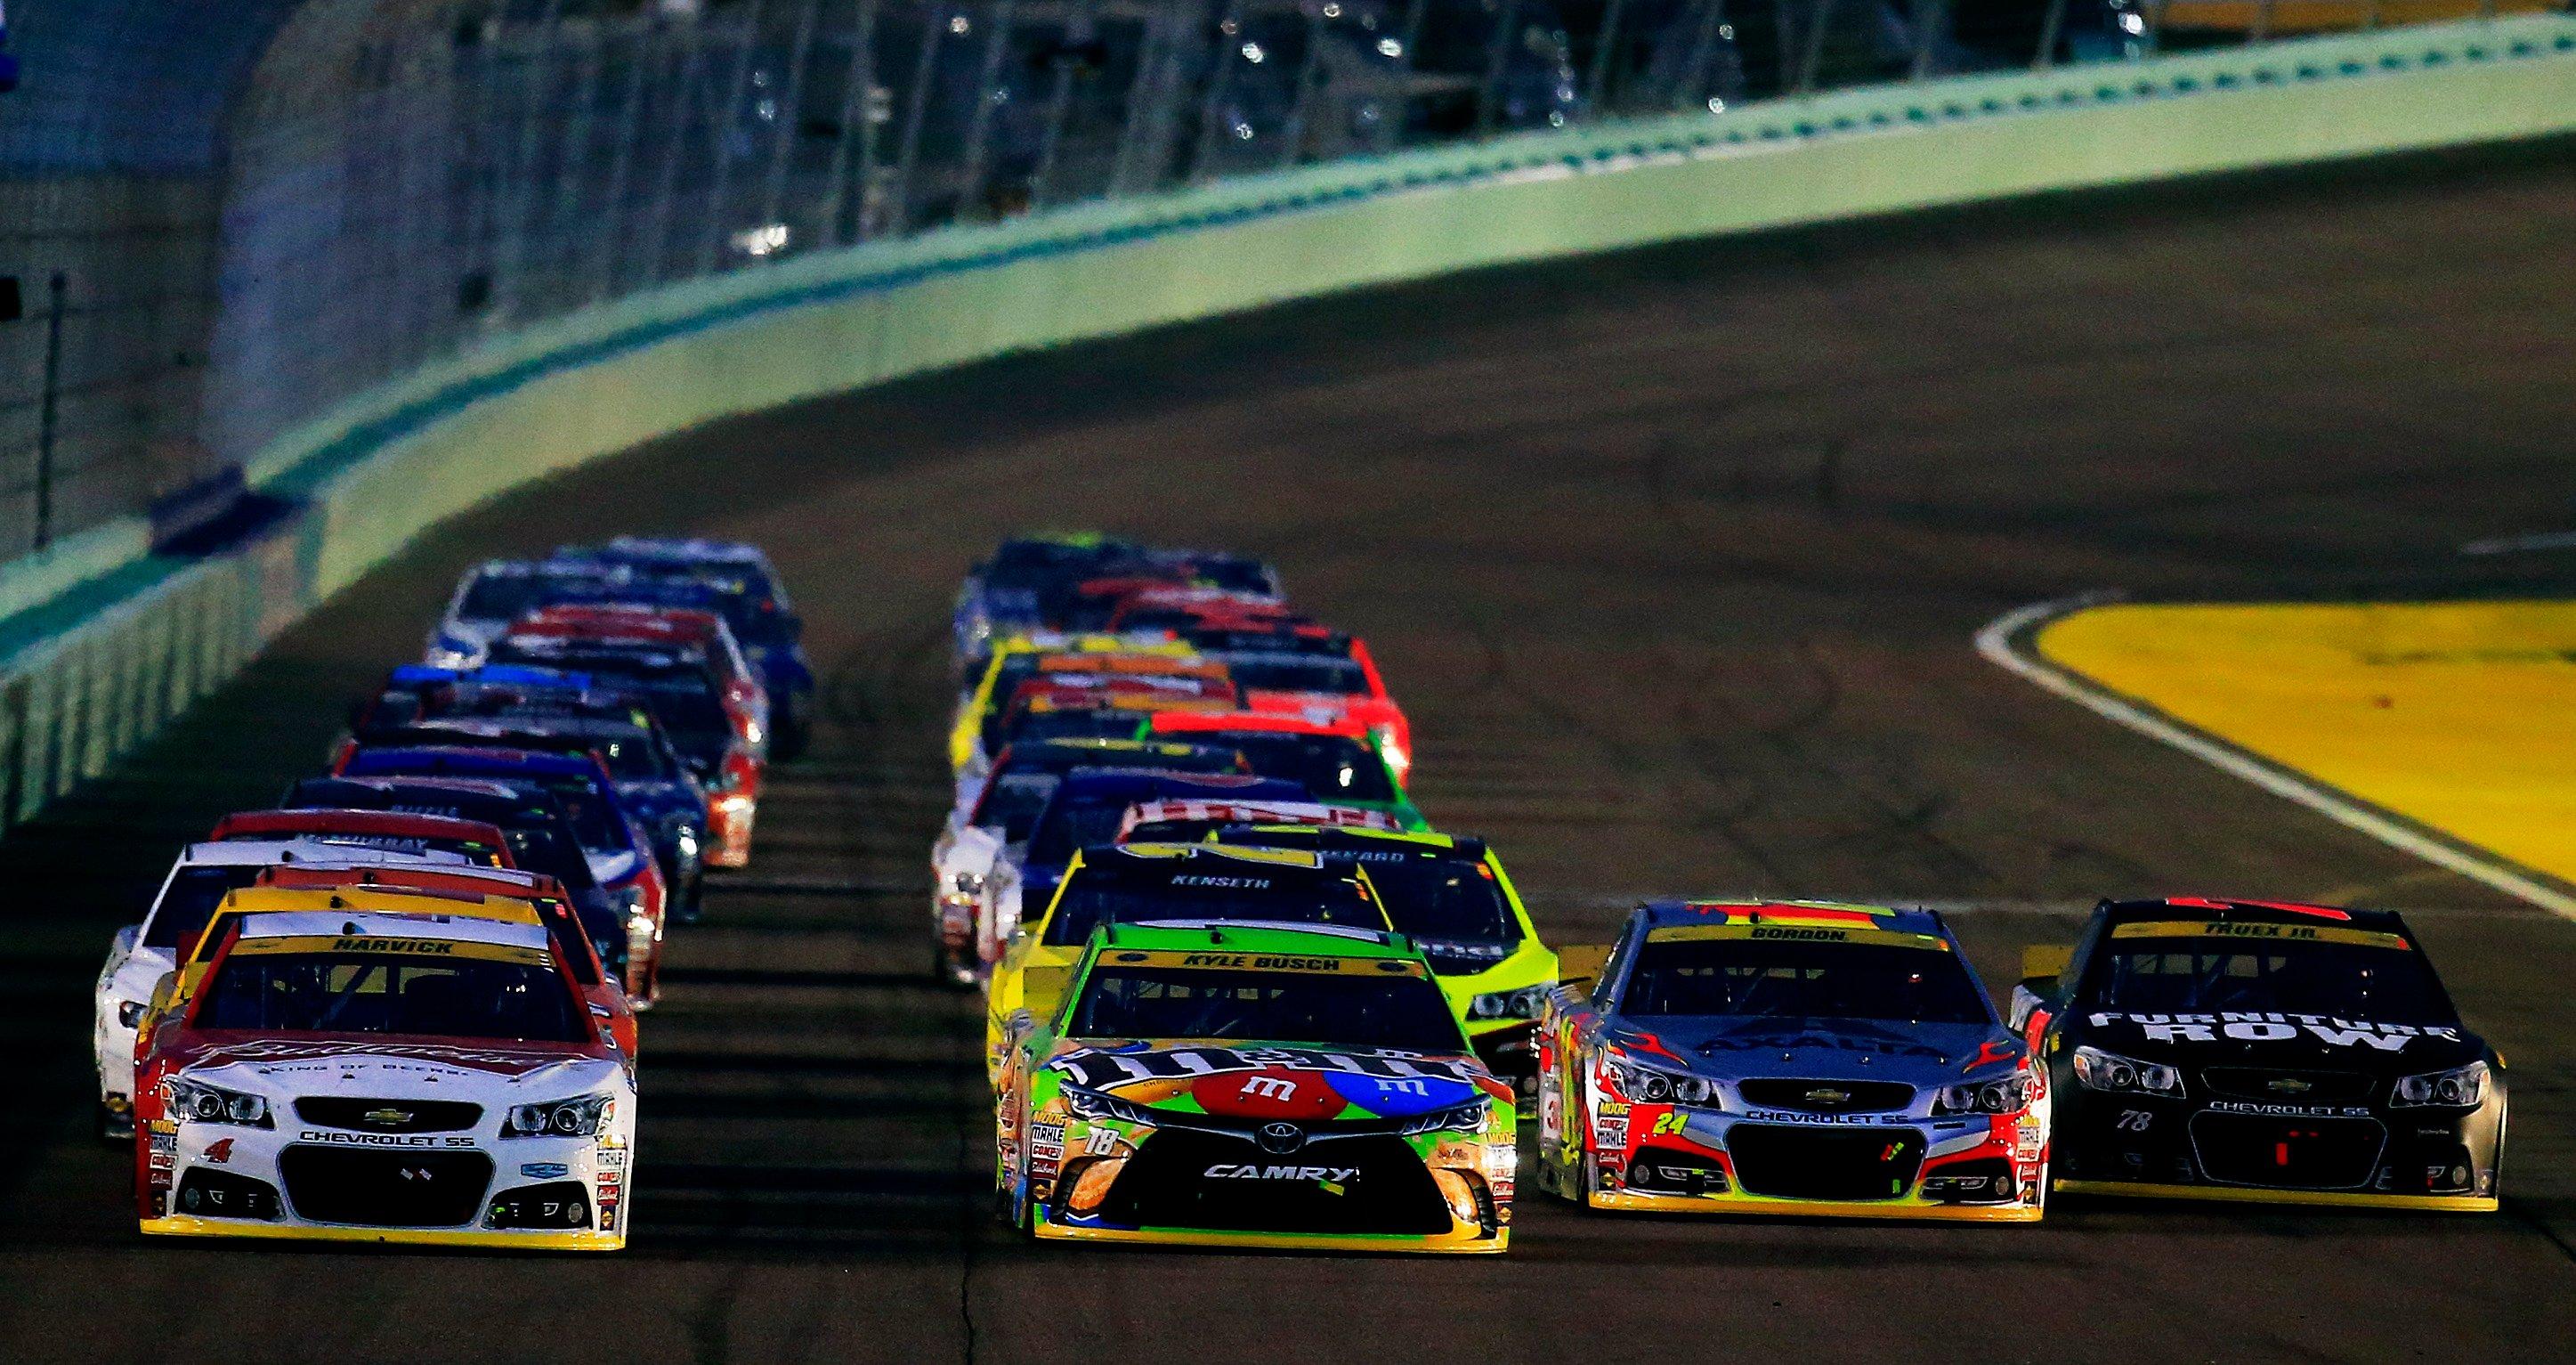 NASCAR Championship 4 - Homestead-Miami Speedway